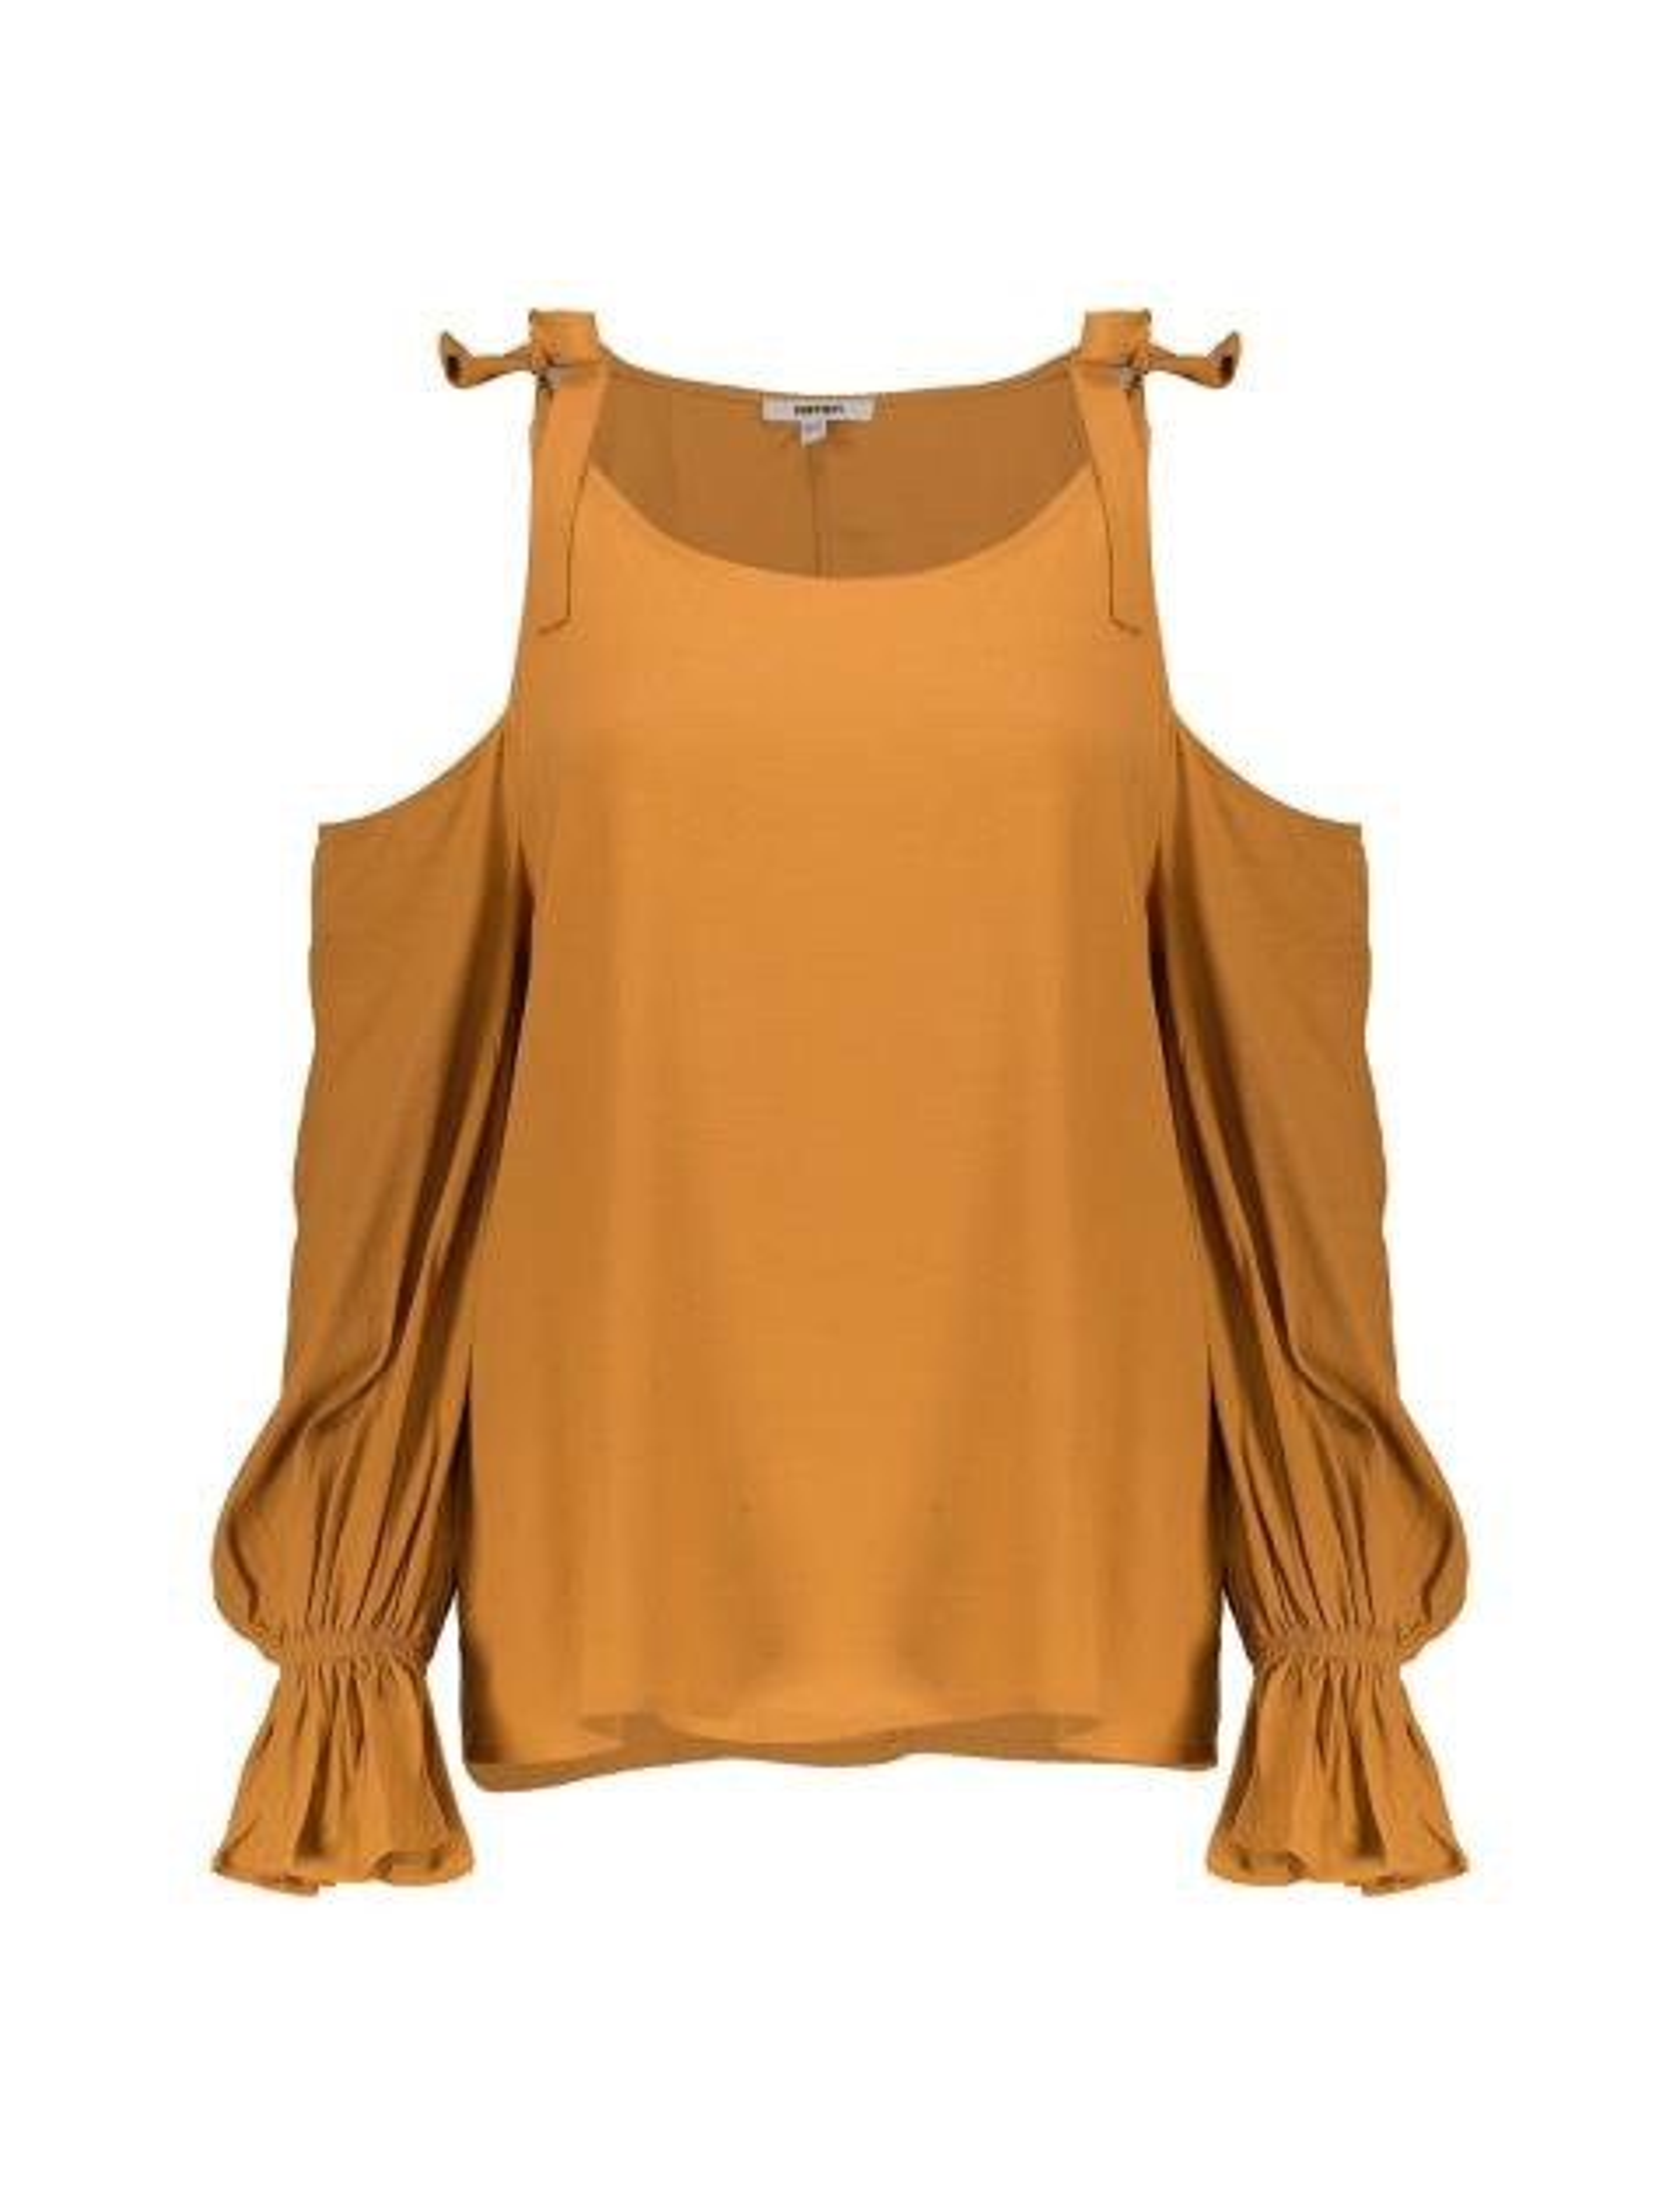 بلوز ویسکوز آستین بلند زنانه - نارنجي - 1